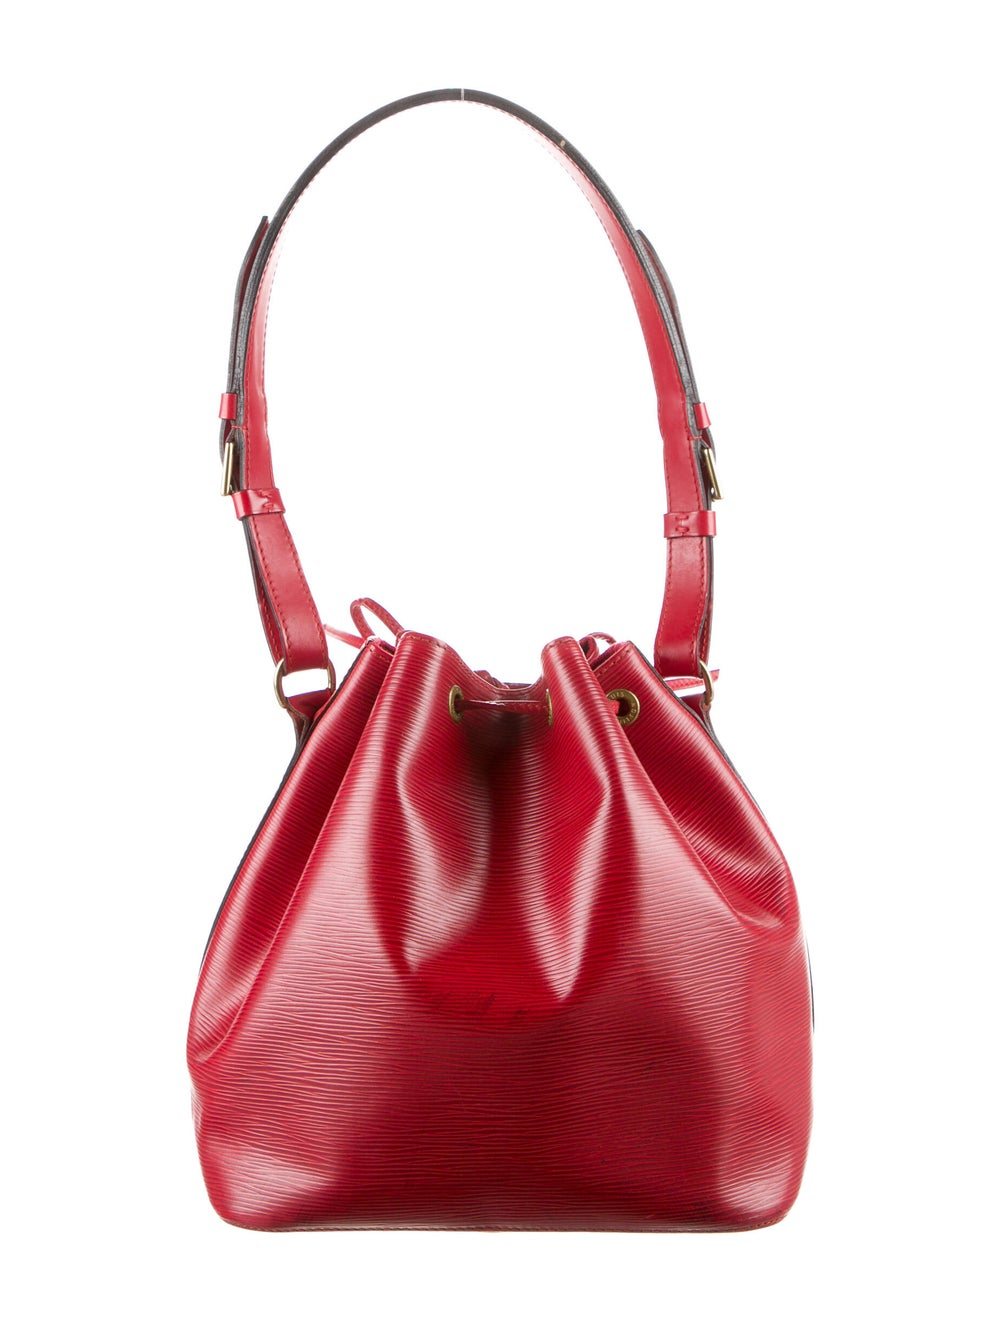 Louis Vuitton Vintage Epi Petit Noe Red - image 4